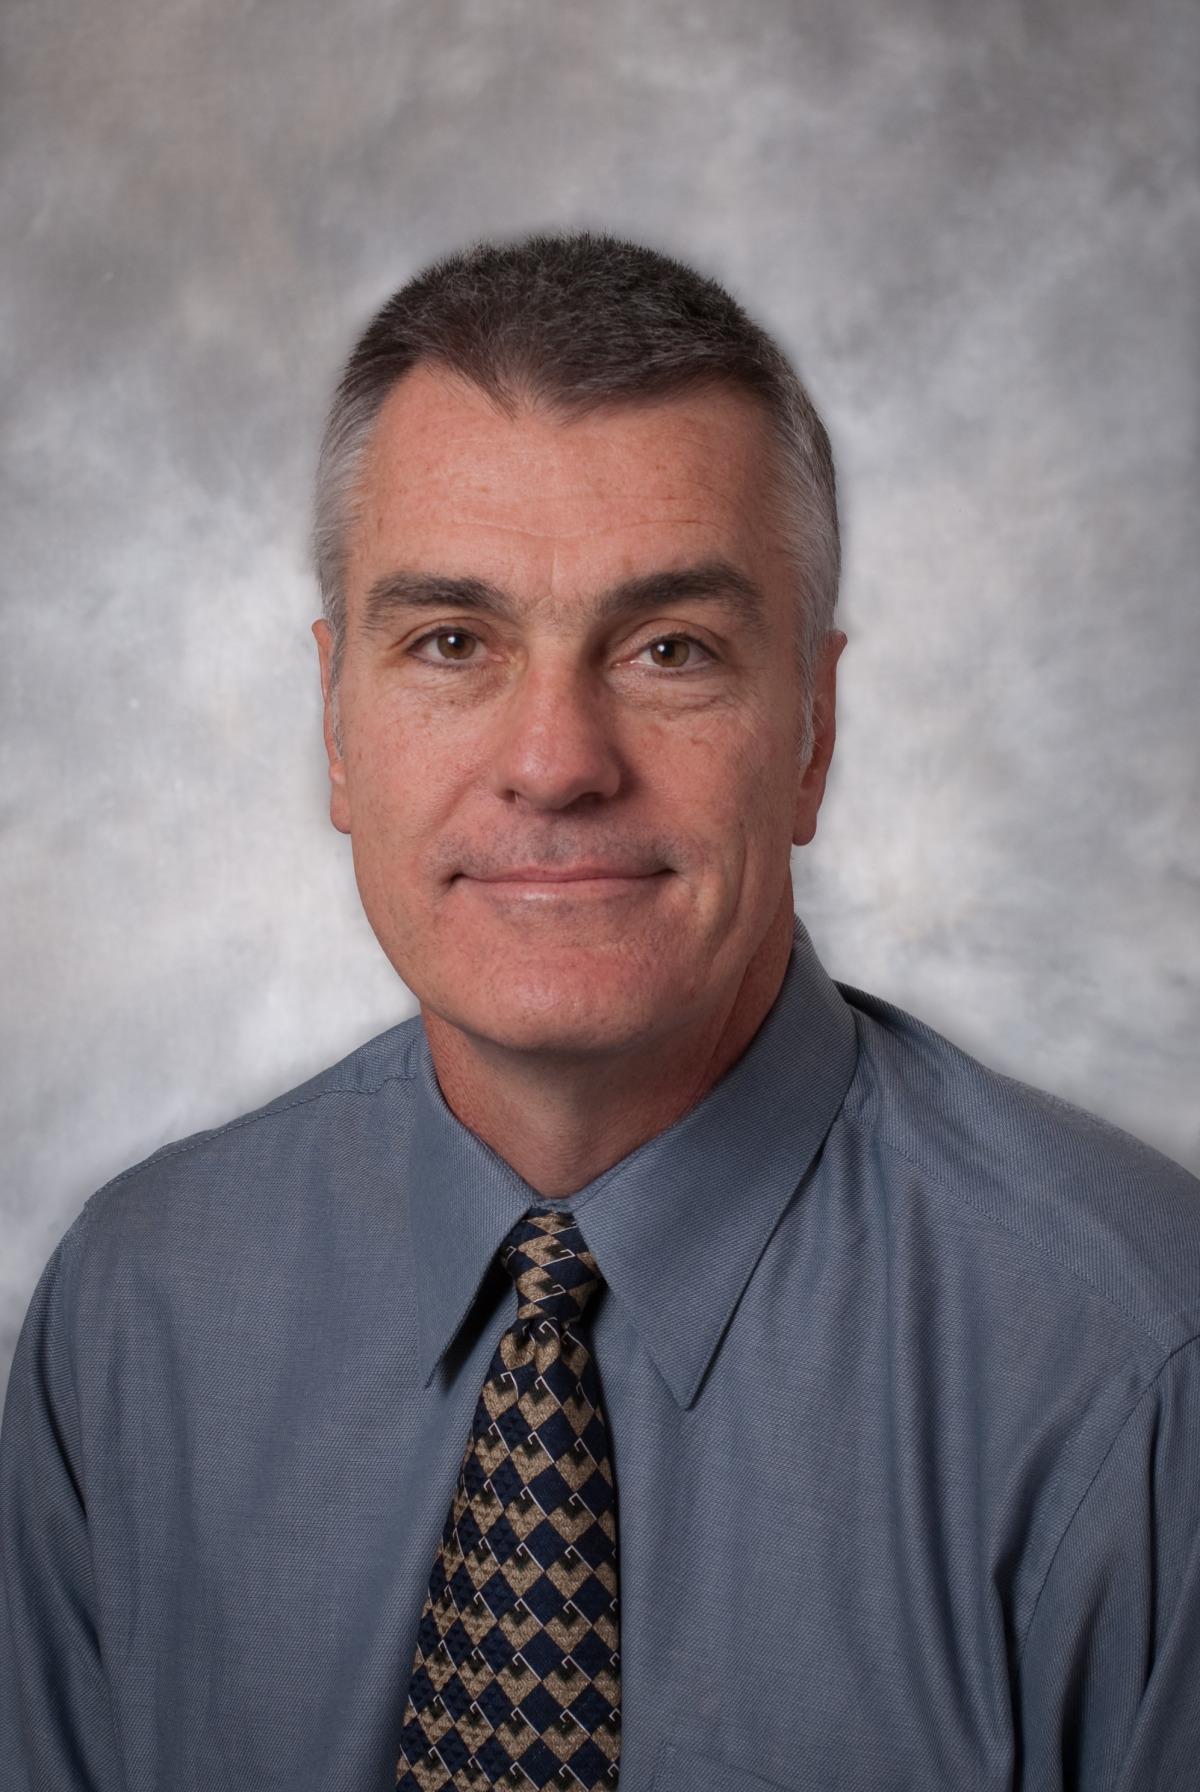 Sports Hernia Surgeon Jeffrey Hoadley M.D.